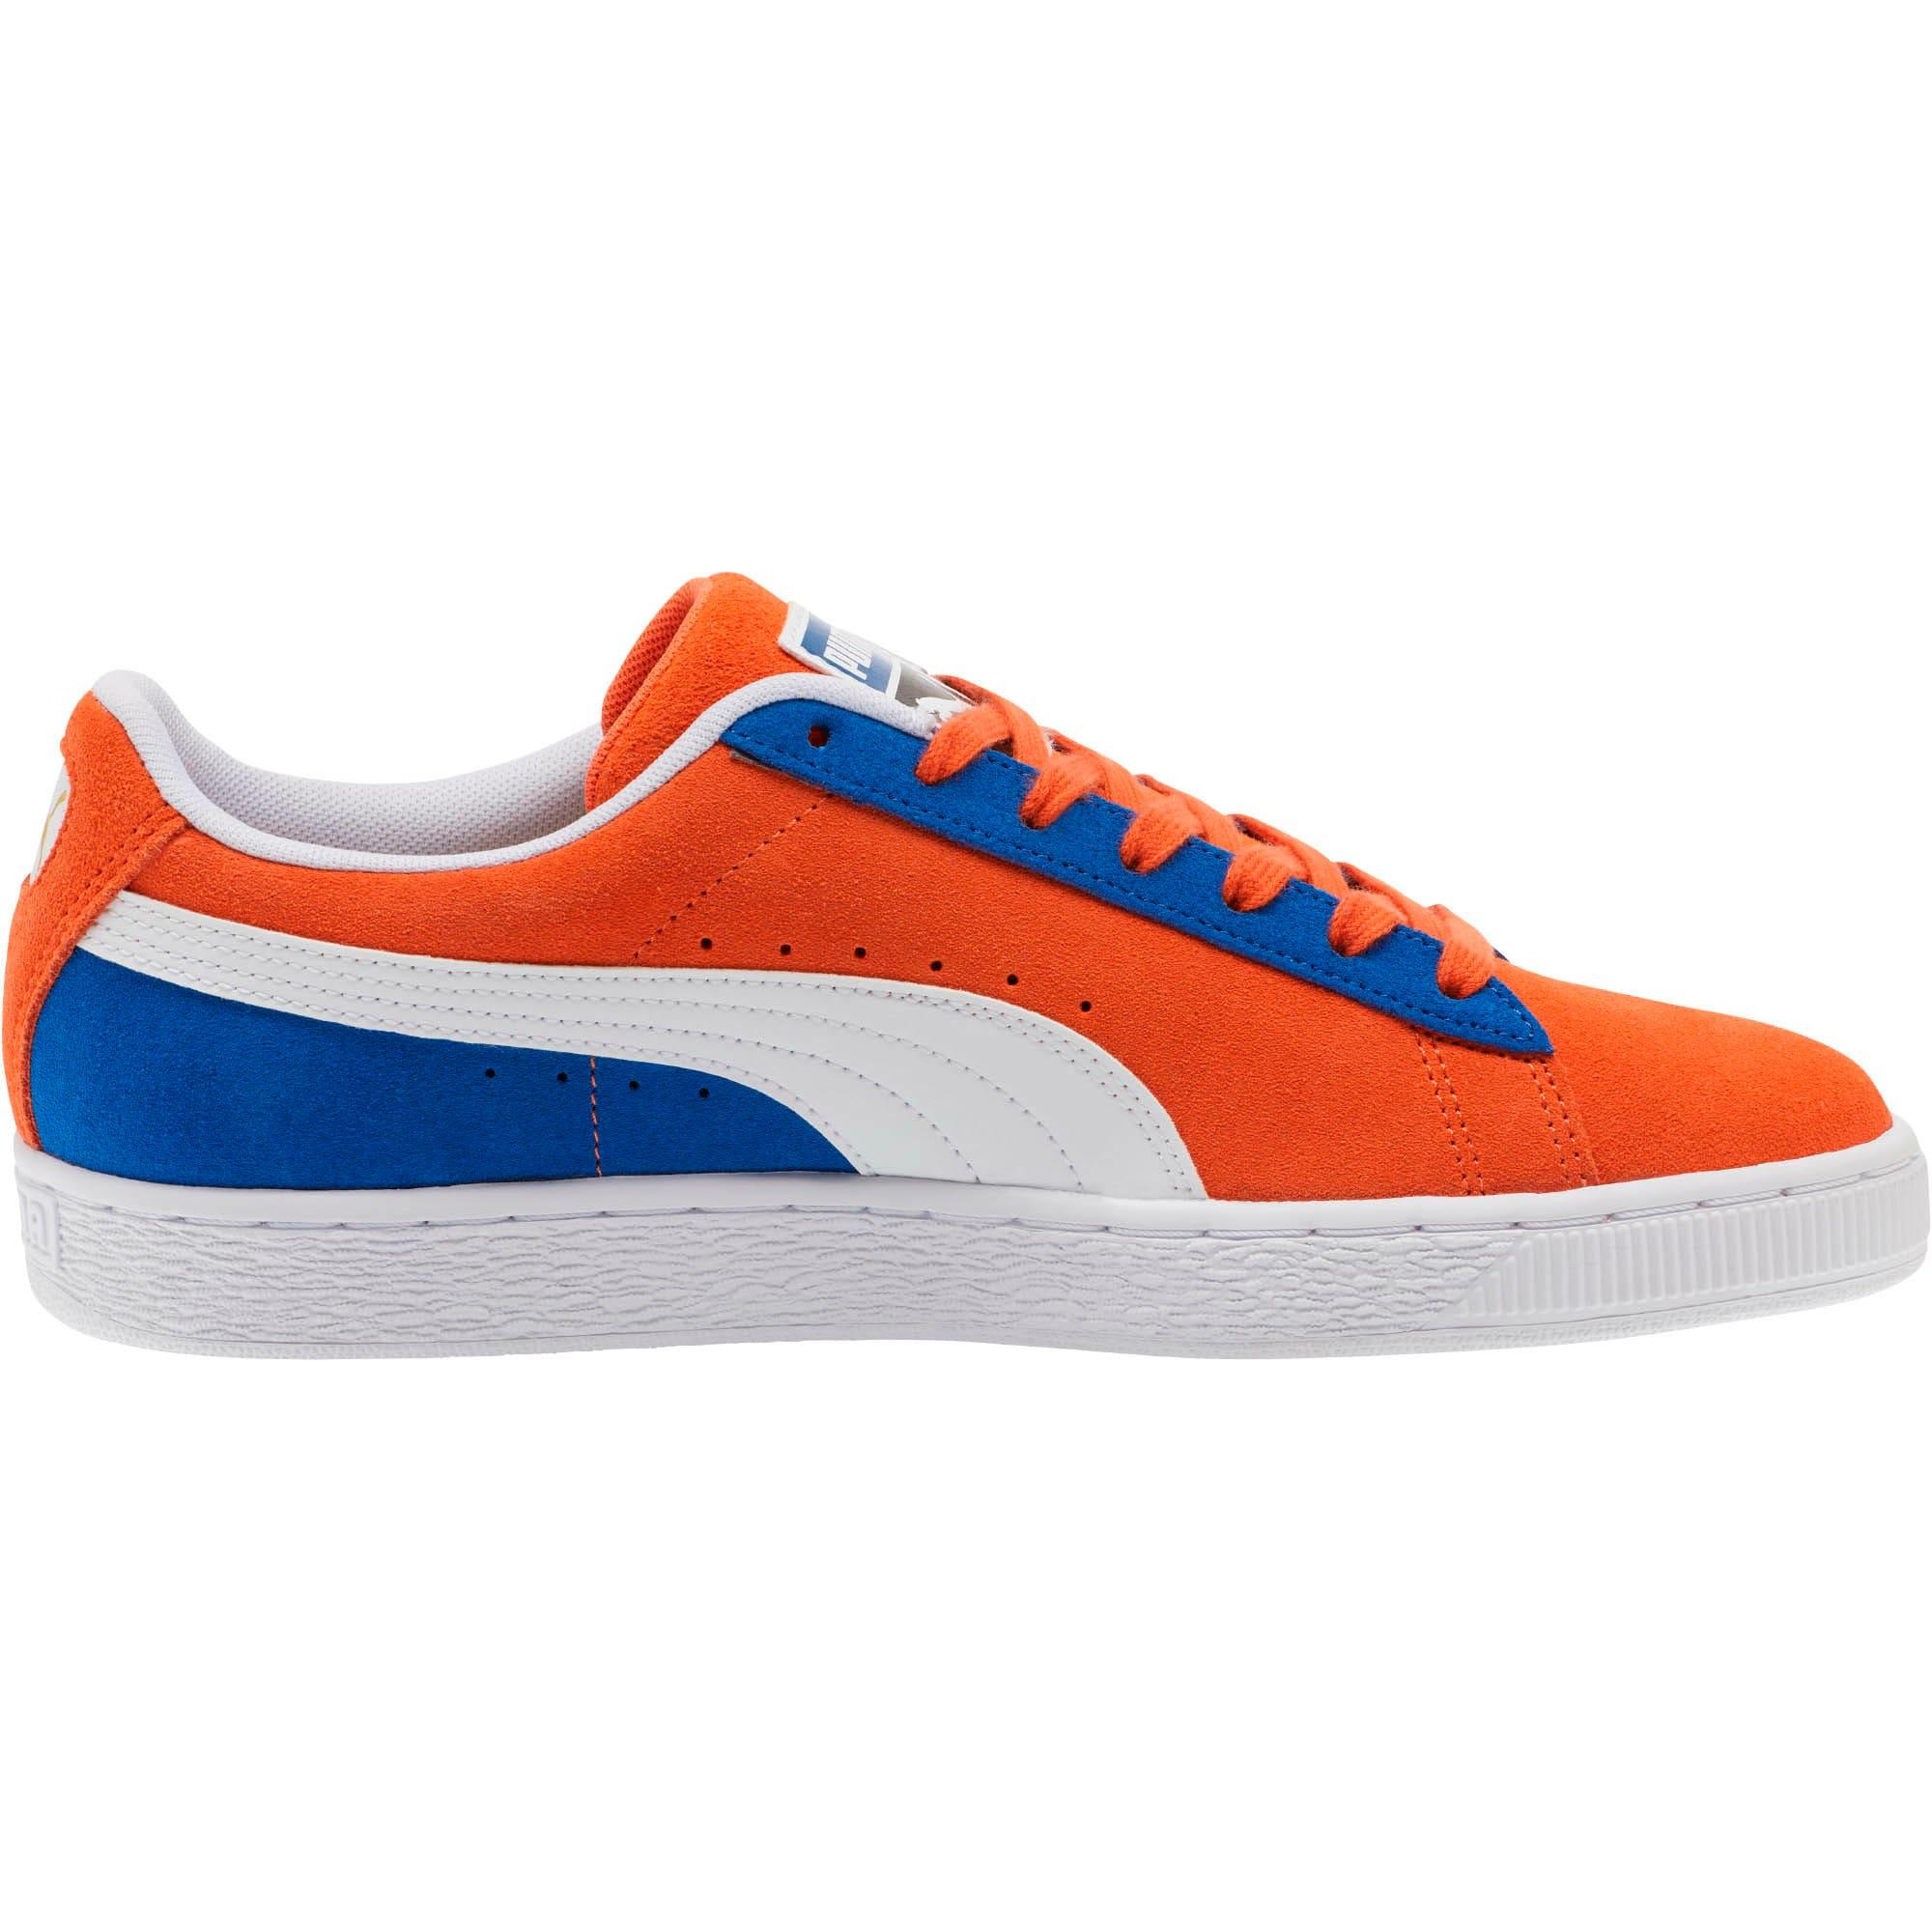 reputable site e518d c3584 Suede Classic Kokono Sneakers